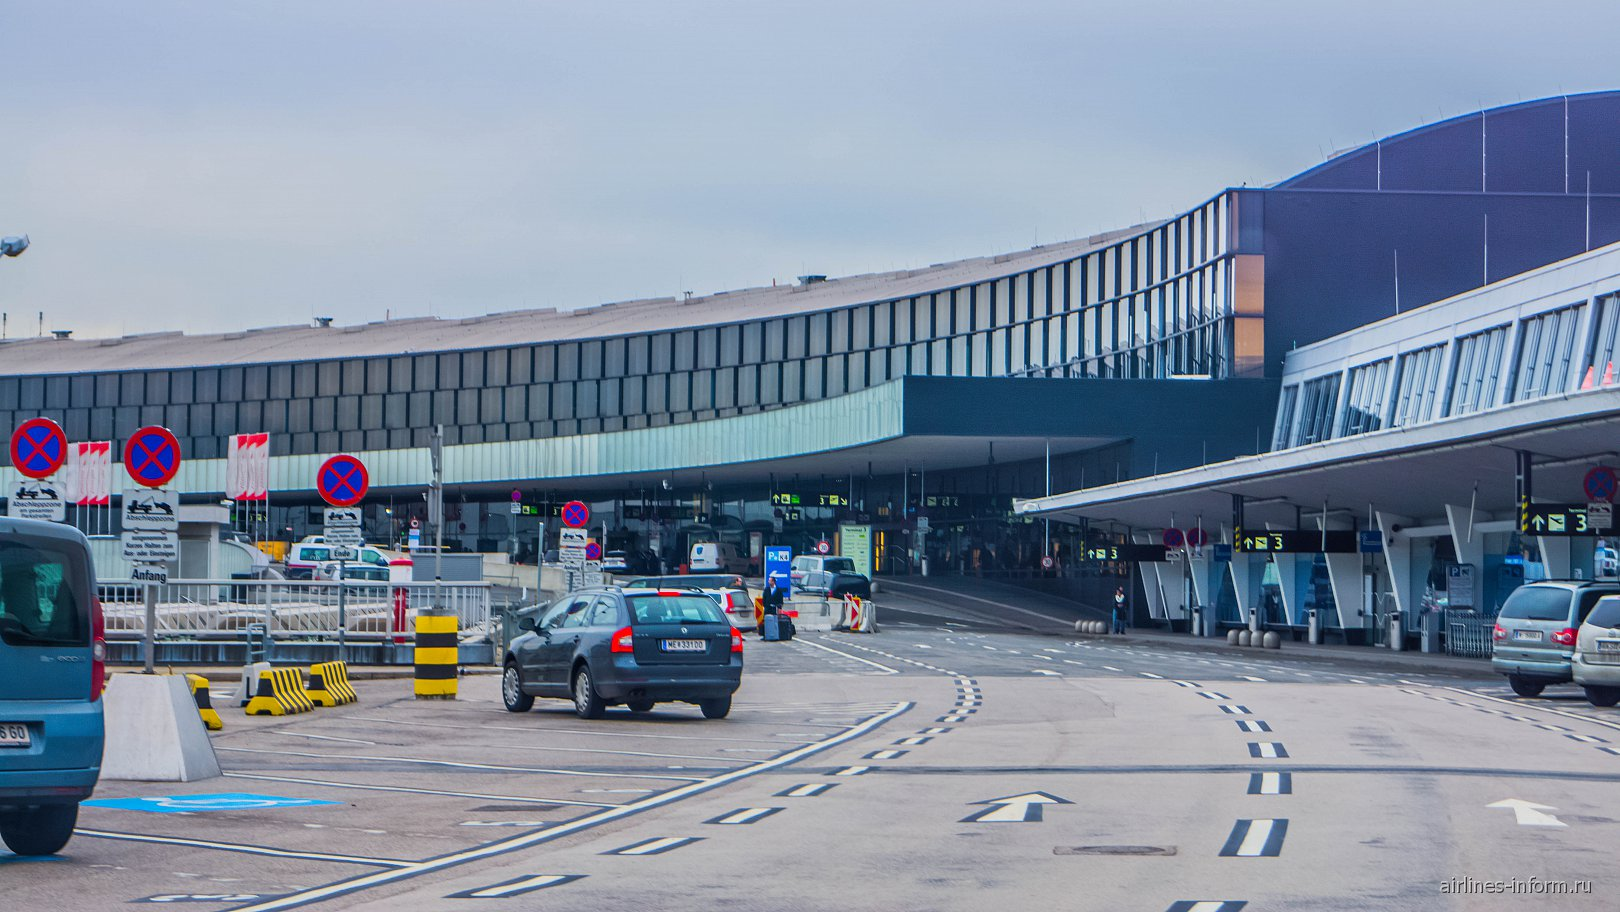 Терминал 3 аэропорта Вена Швехат